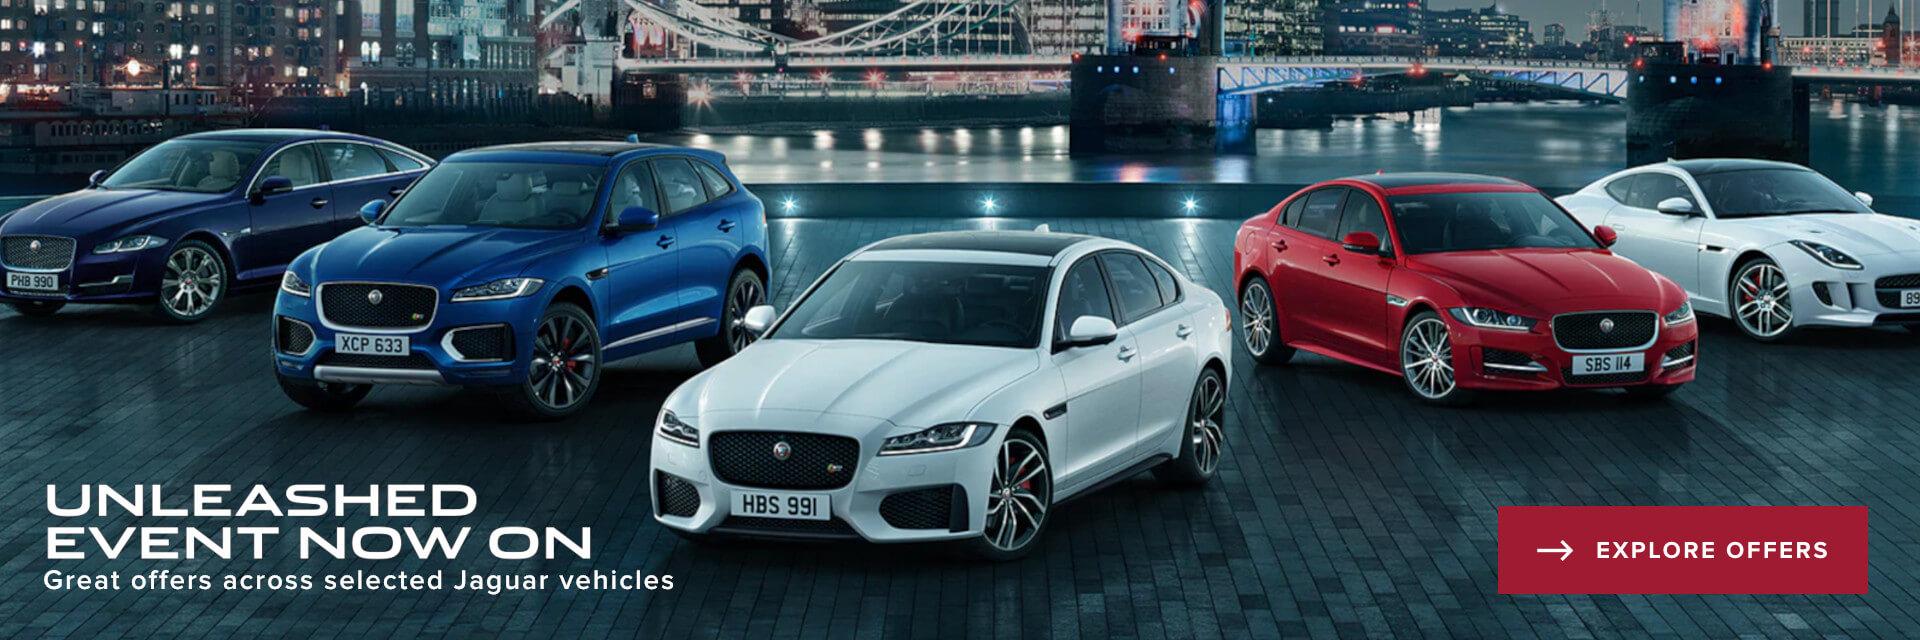 Unleashed Event Jaguar Offers